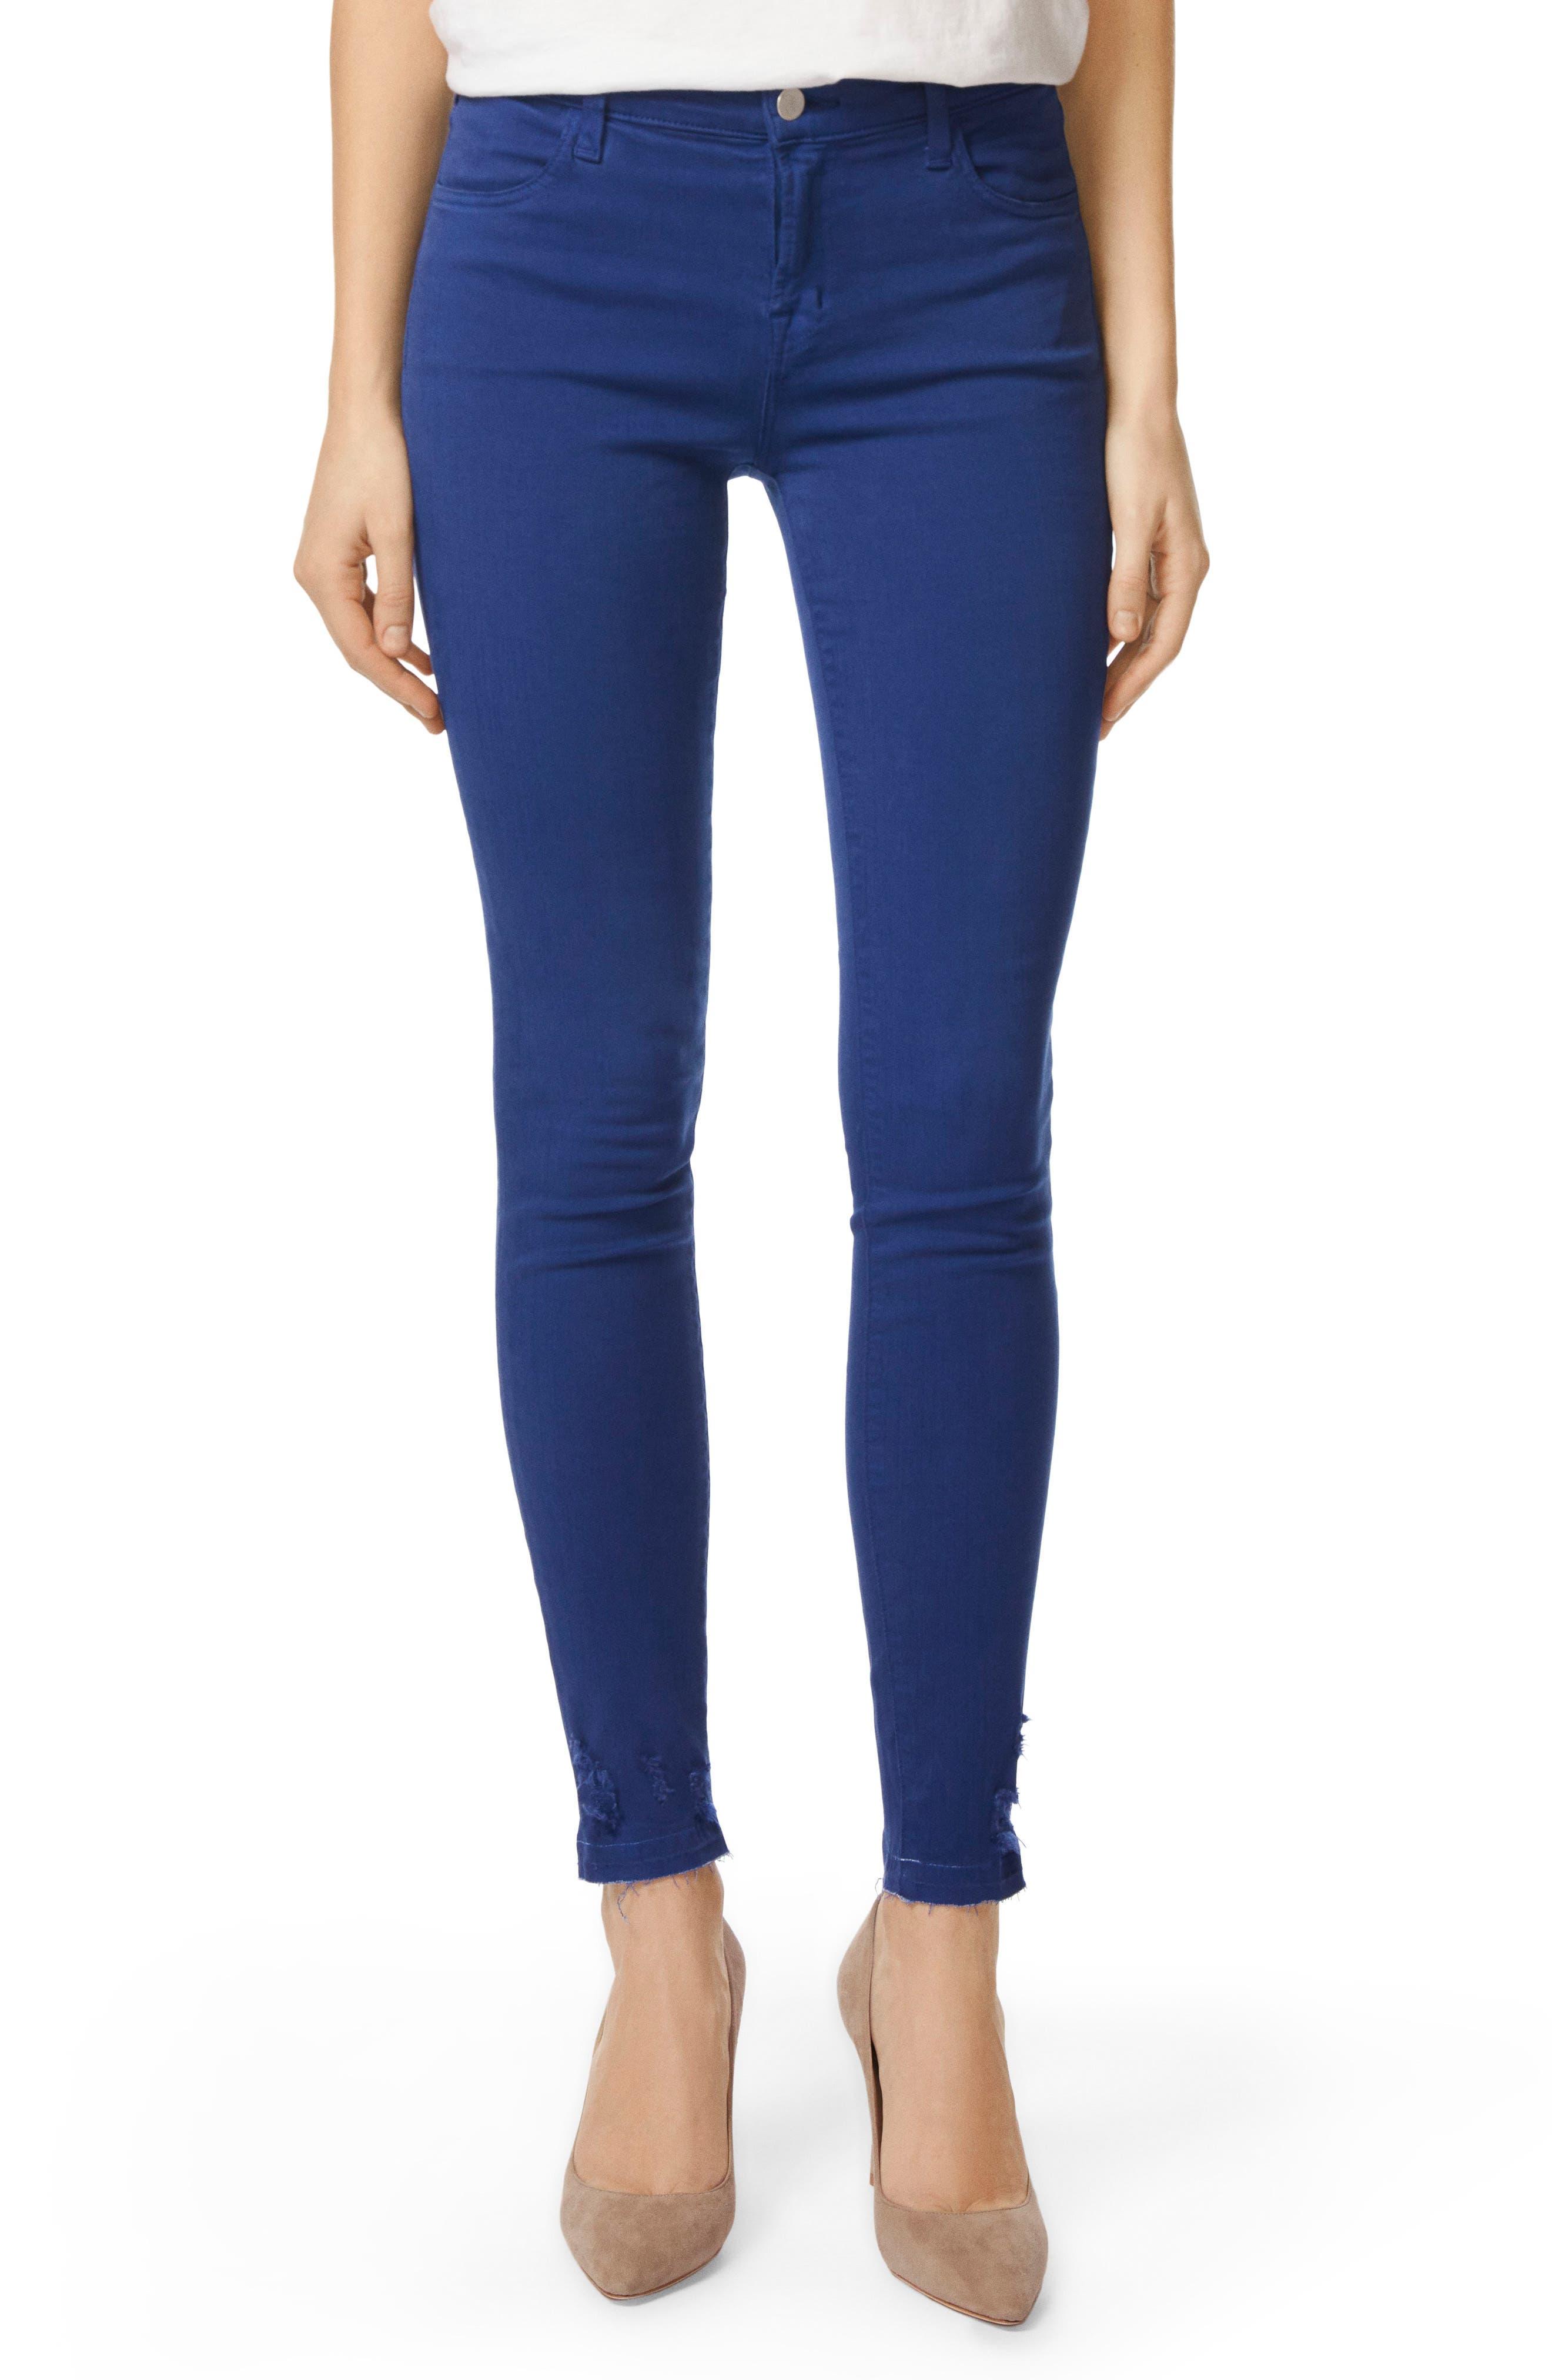 620 Mid Rise Super Skinny Jeans,                             Main thumbnail 1, color,                             Electric Sea Destruct